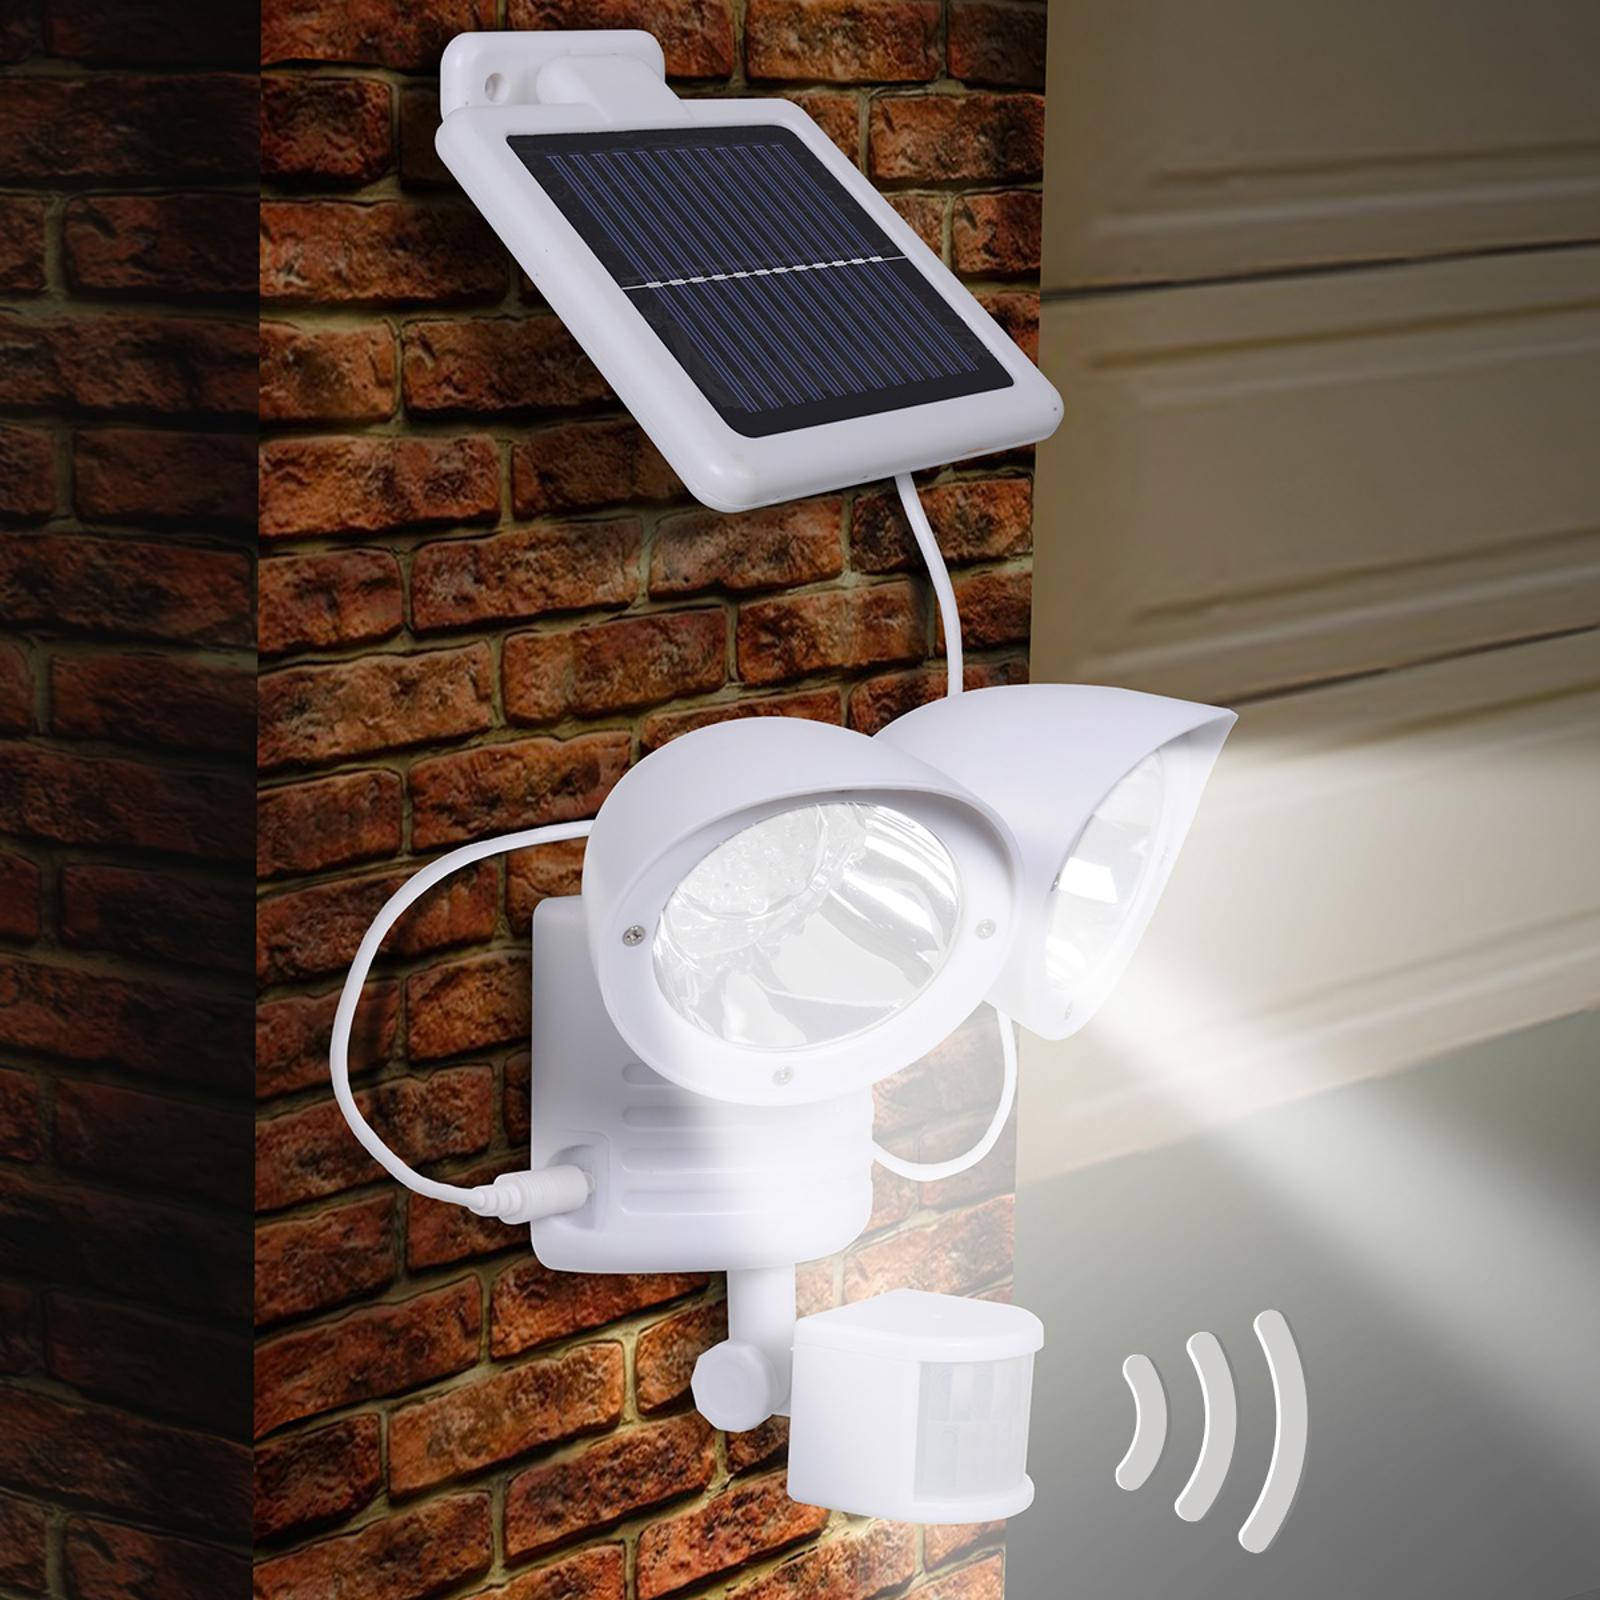 Maex sensor solar light for walls, two-bulb_4014992_1